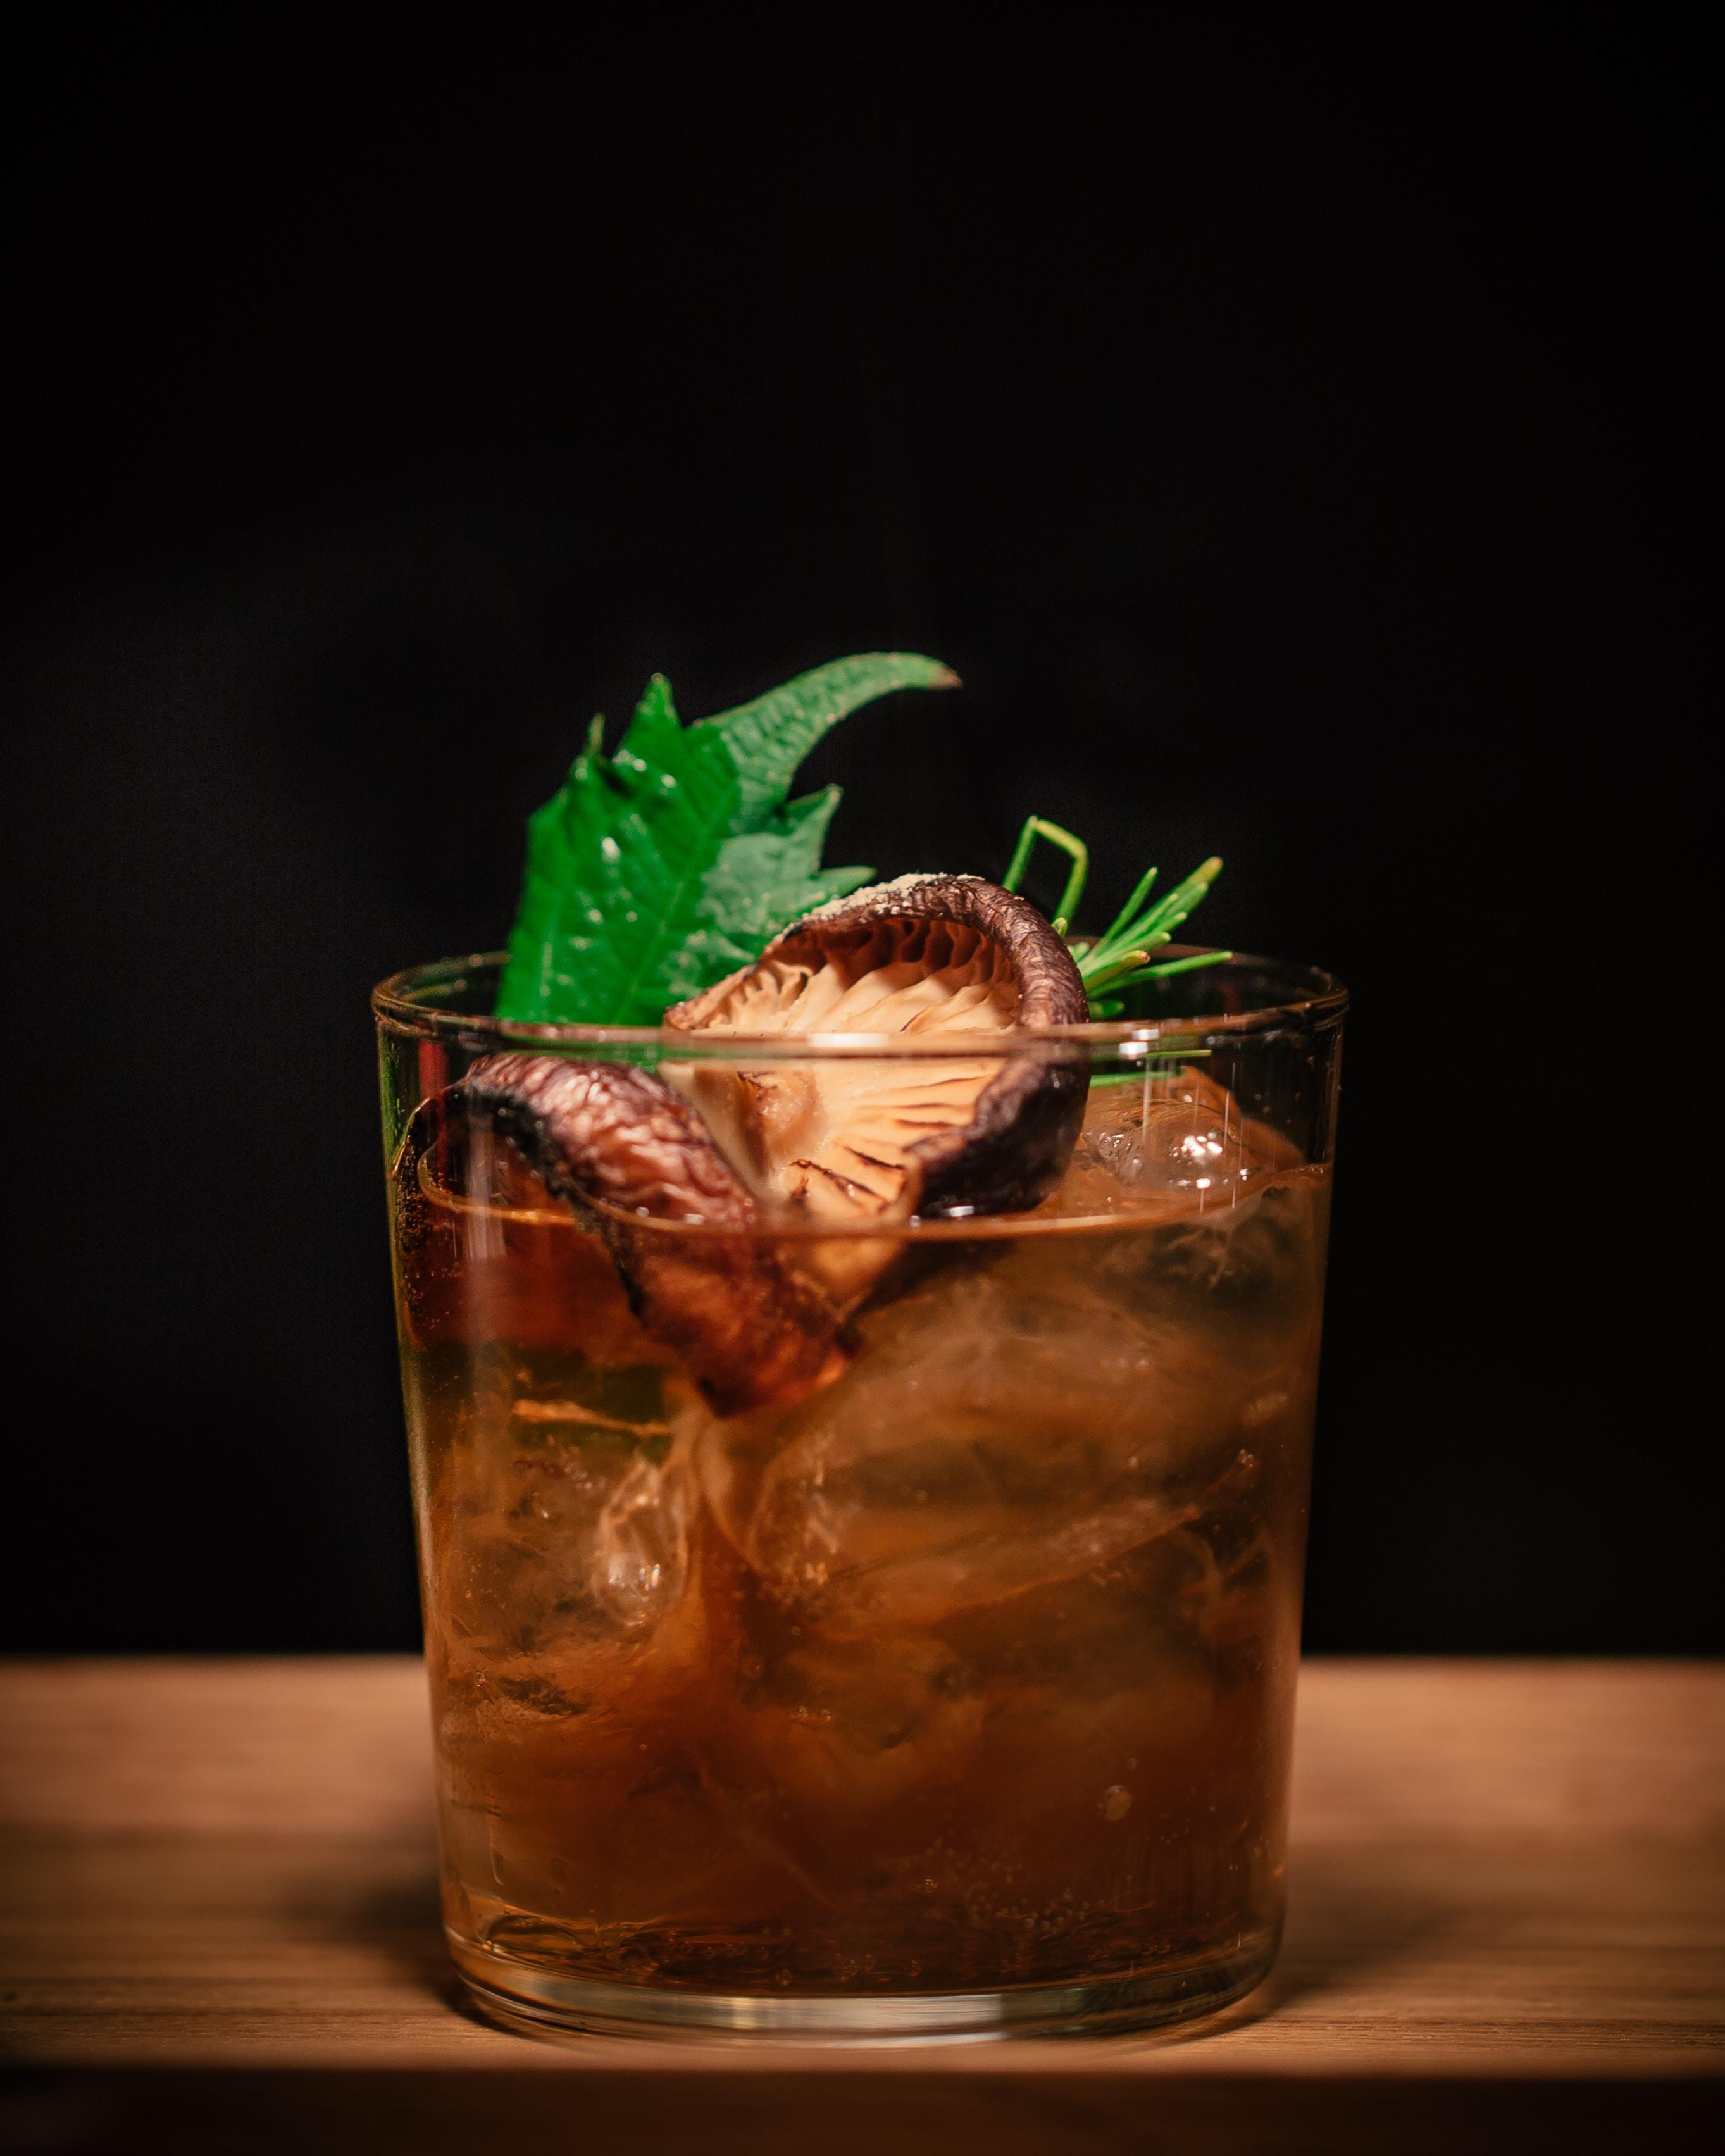 brown mushroom on drinking glass